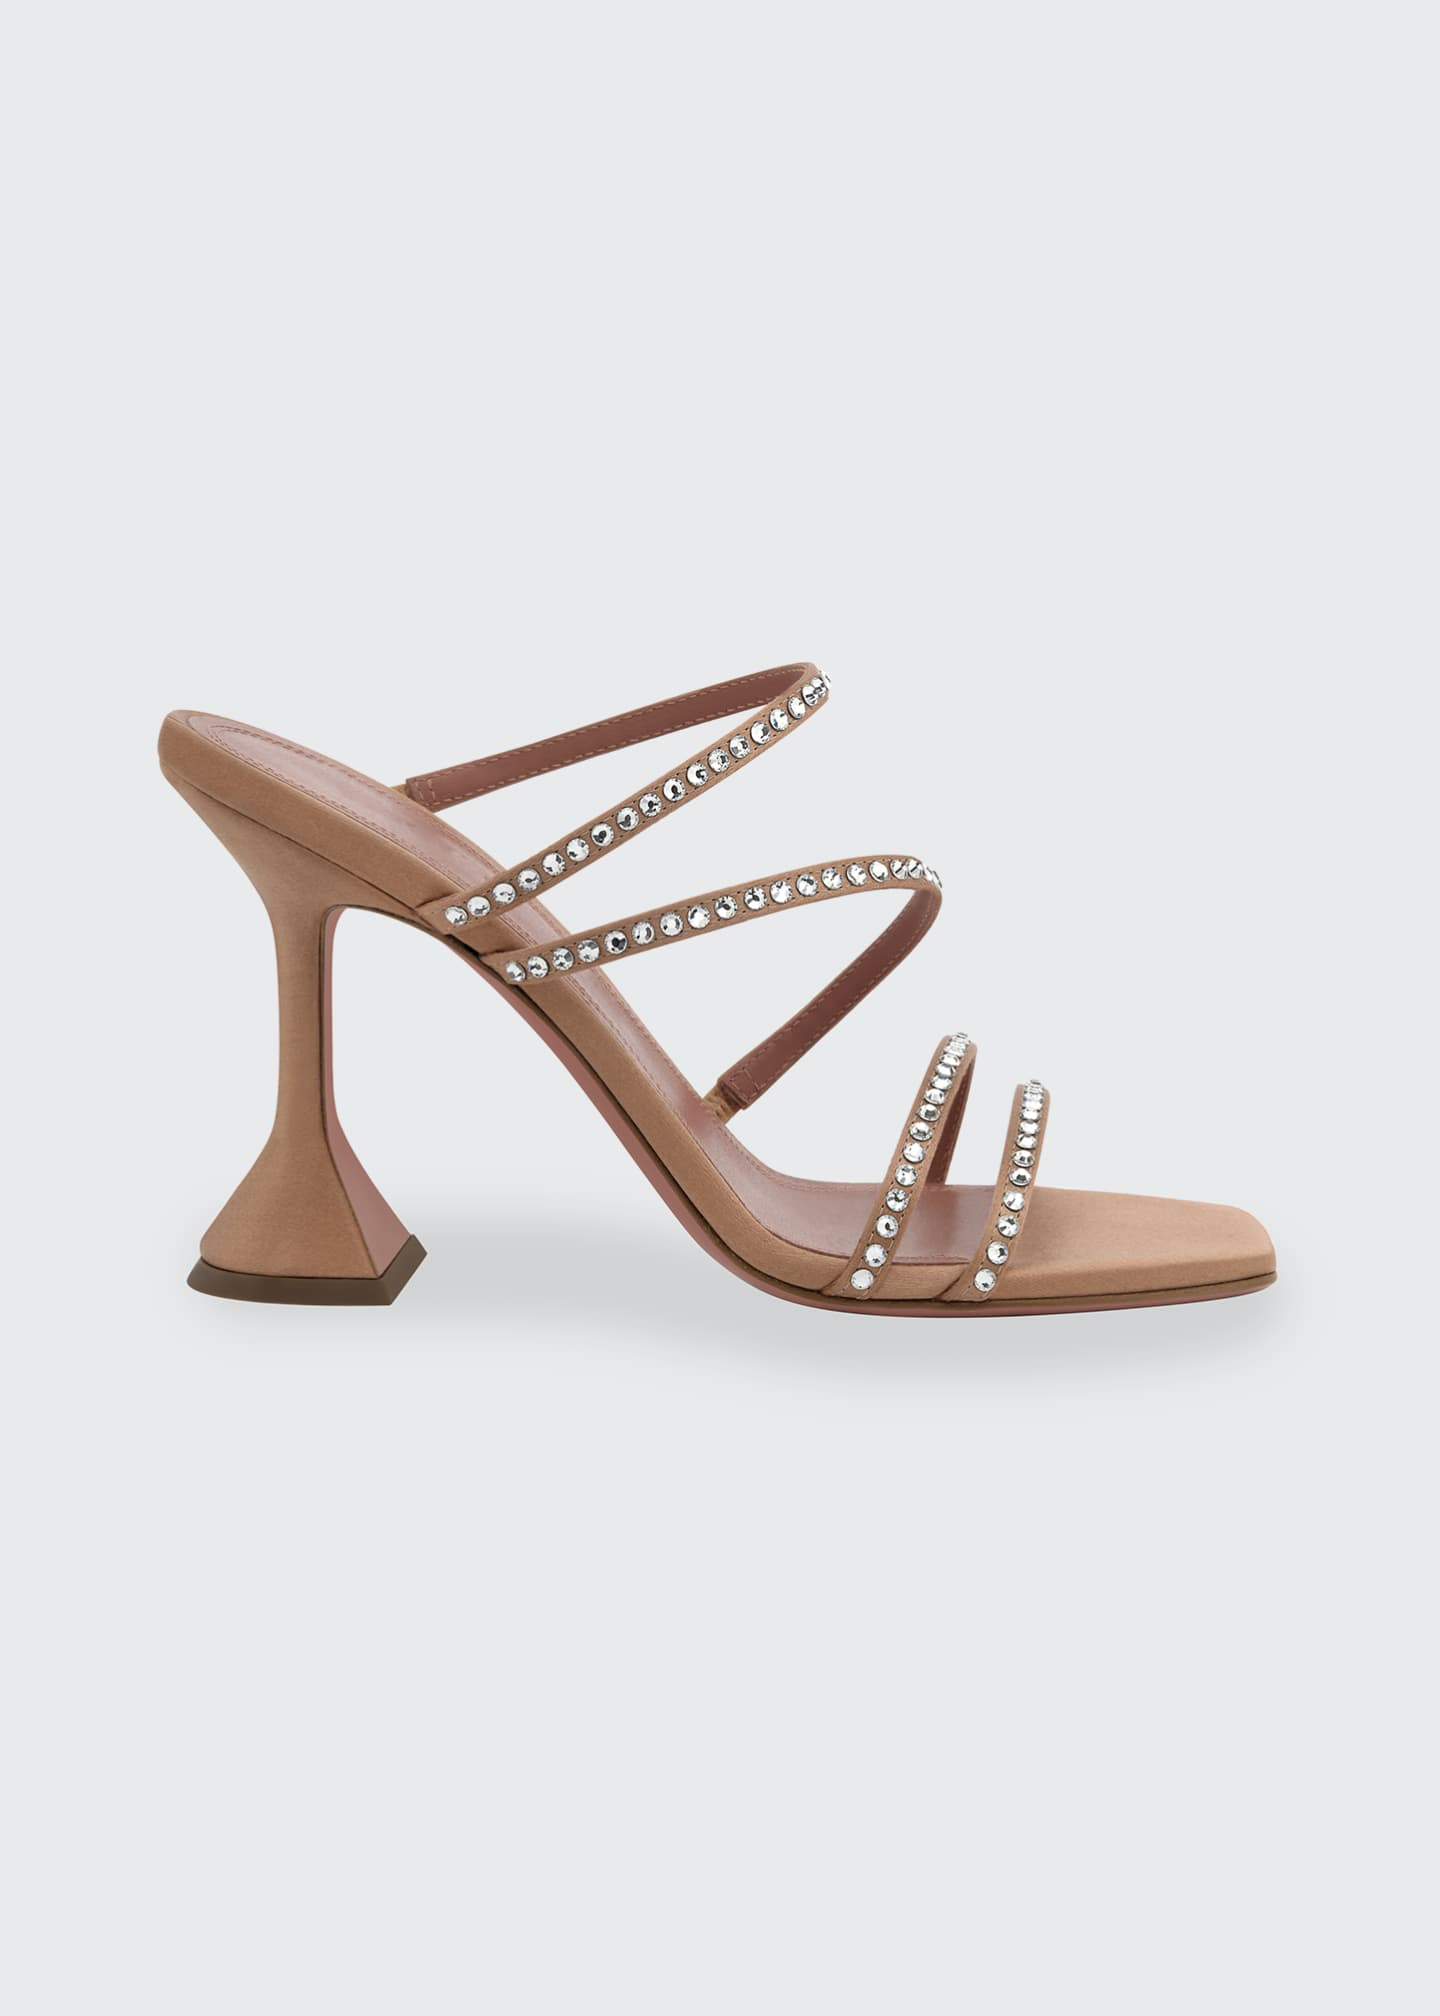 Naima Crystal Silk Slide Sandals by Amina Muaddi, available on bergdorfgoodman.com for $970 Hailey Baldwin Shoes Exact Product